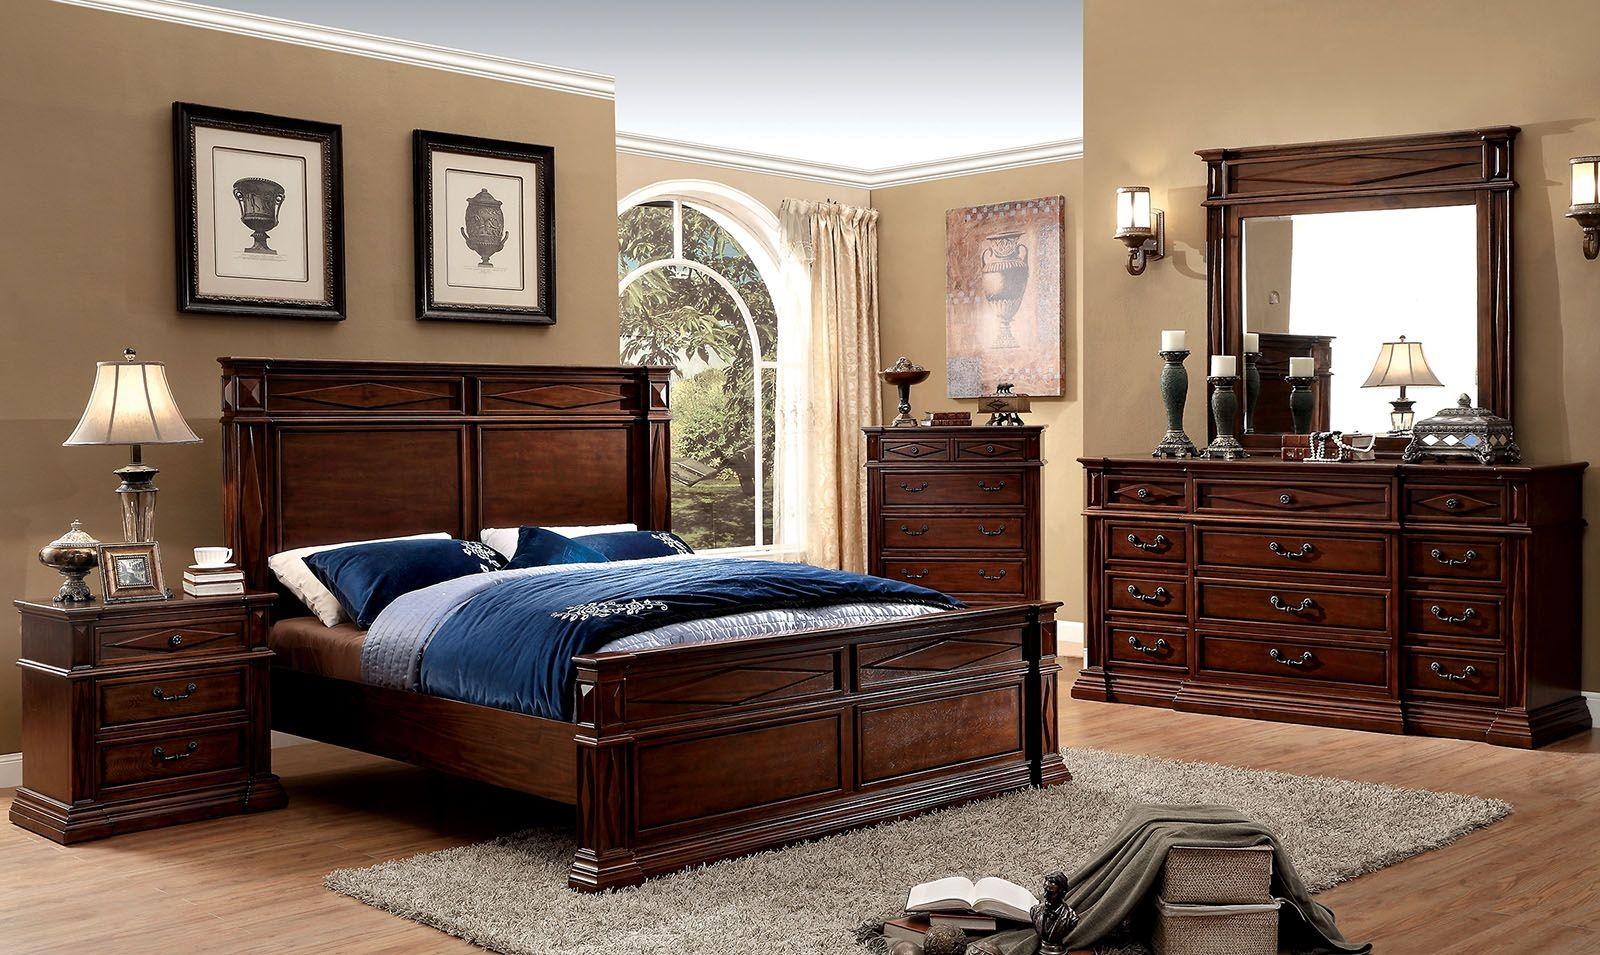 Gayle Cherry Panel Bedroom Set, CM7138Q, Furniture Of America